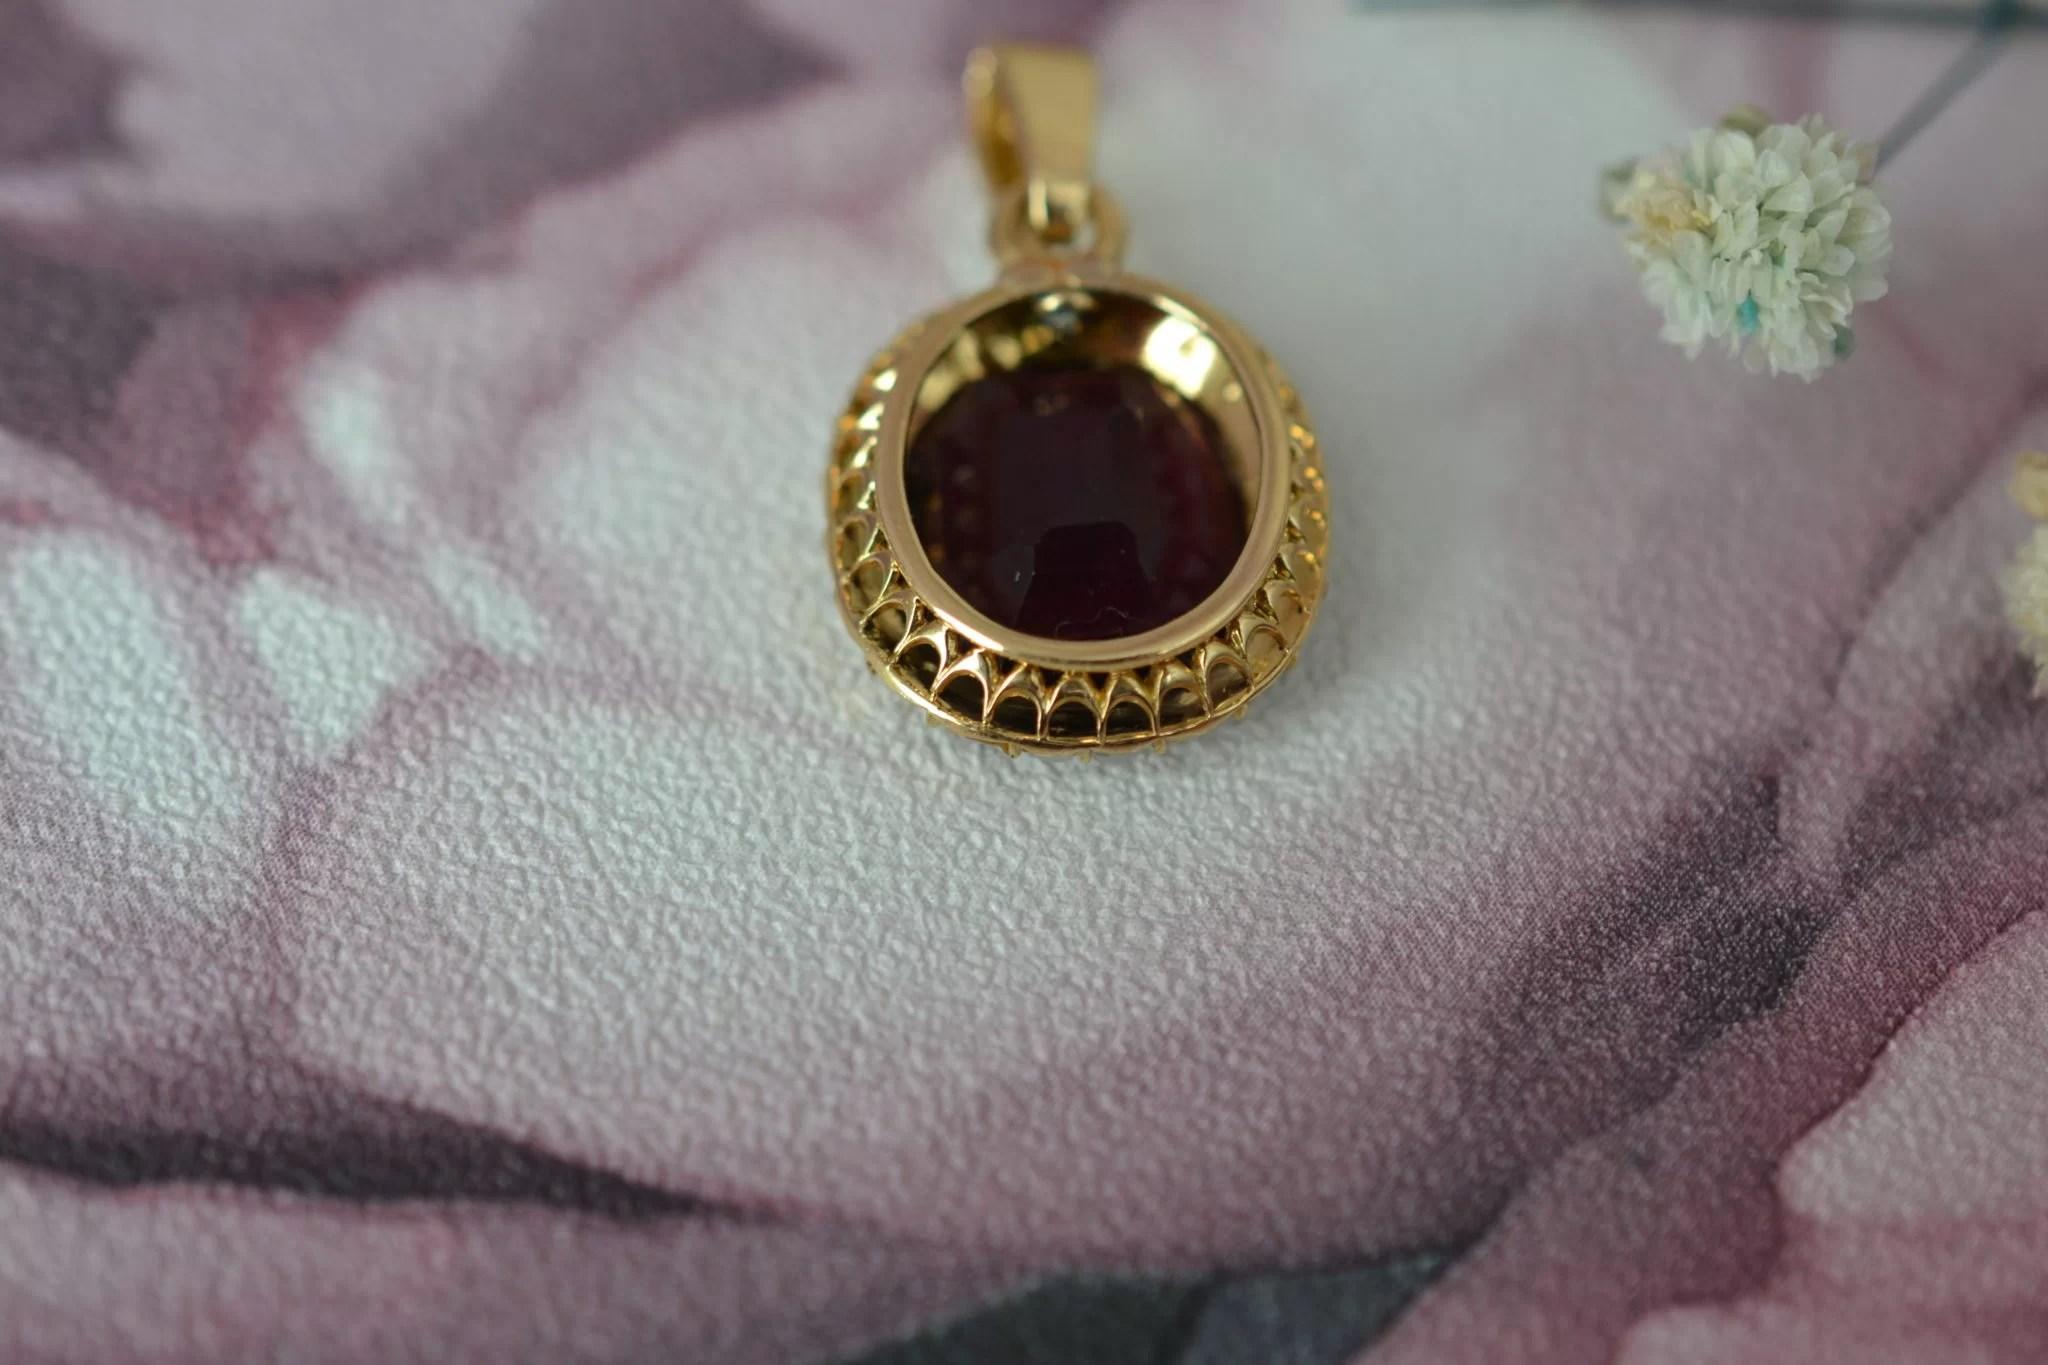 Pendentif en Or jaune serti d_une verrerie couleur grenat et perles fantaisies - bijou ancien